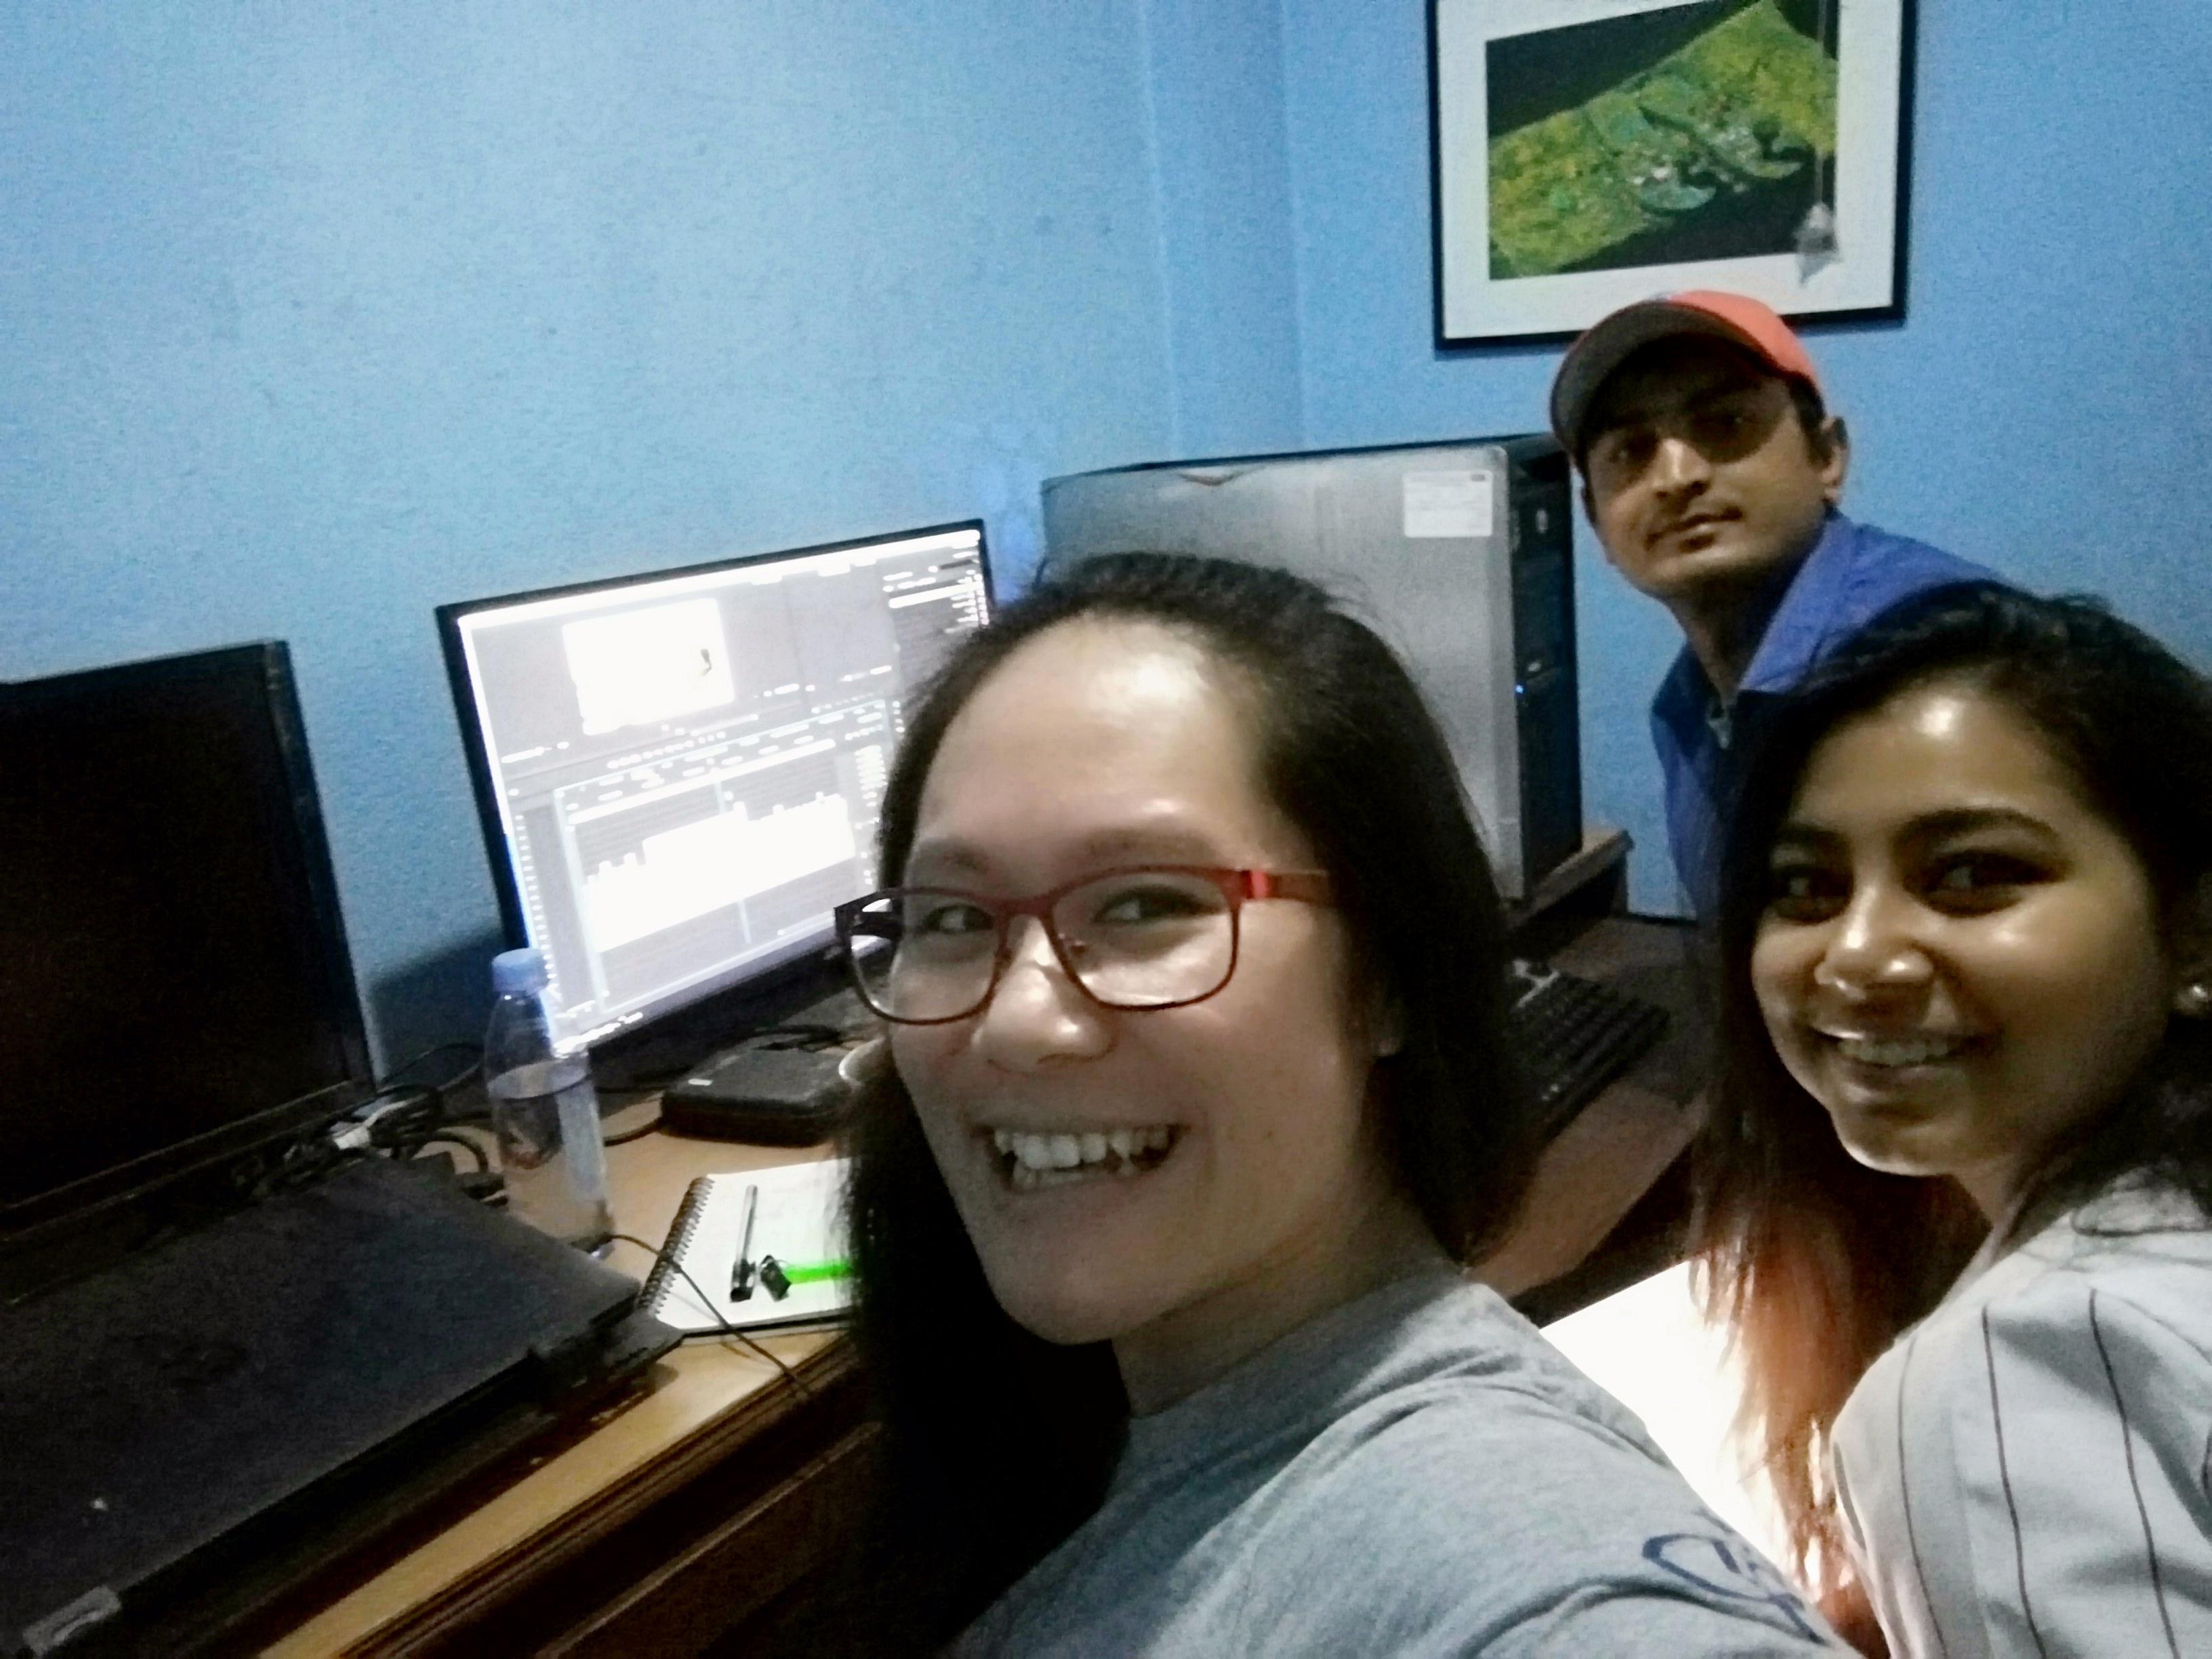 Conducting Editing of Videos